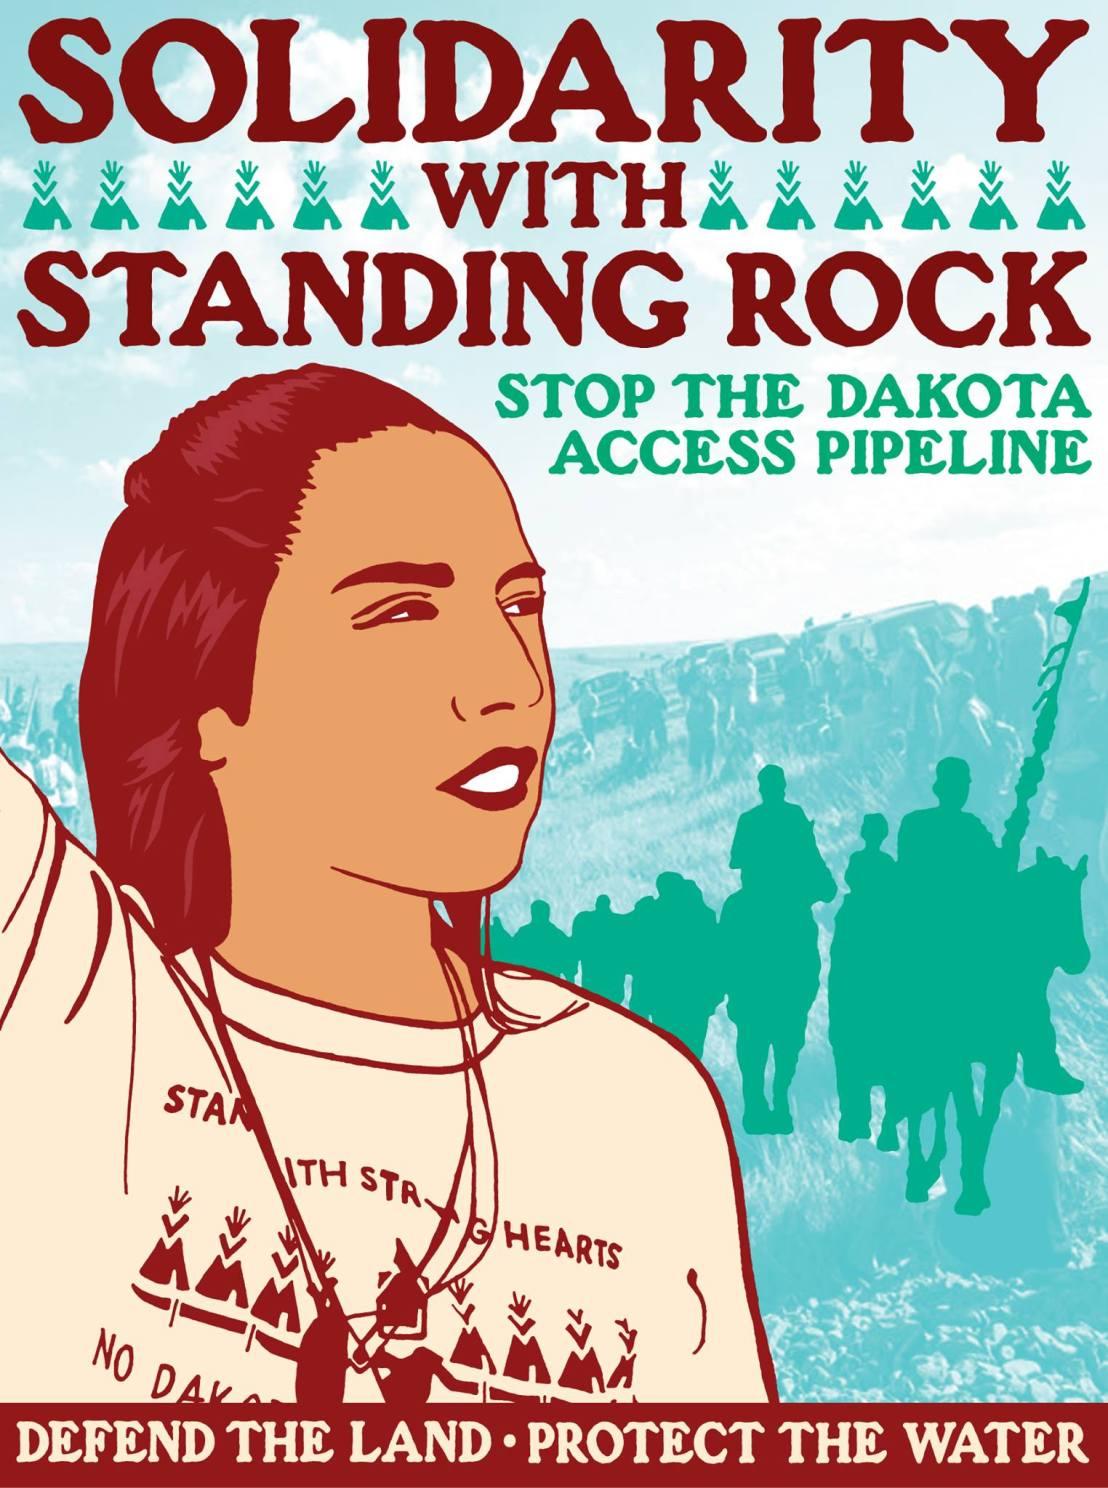 StandingRock-dakotaposter[1]